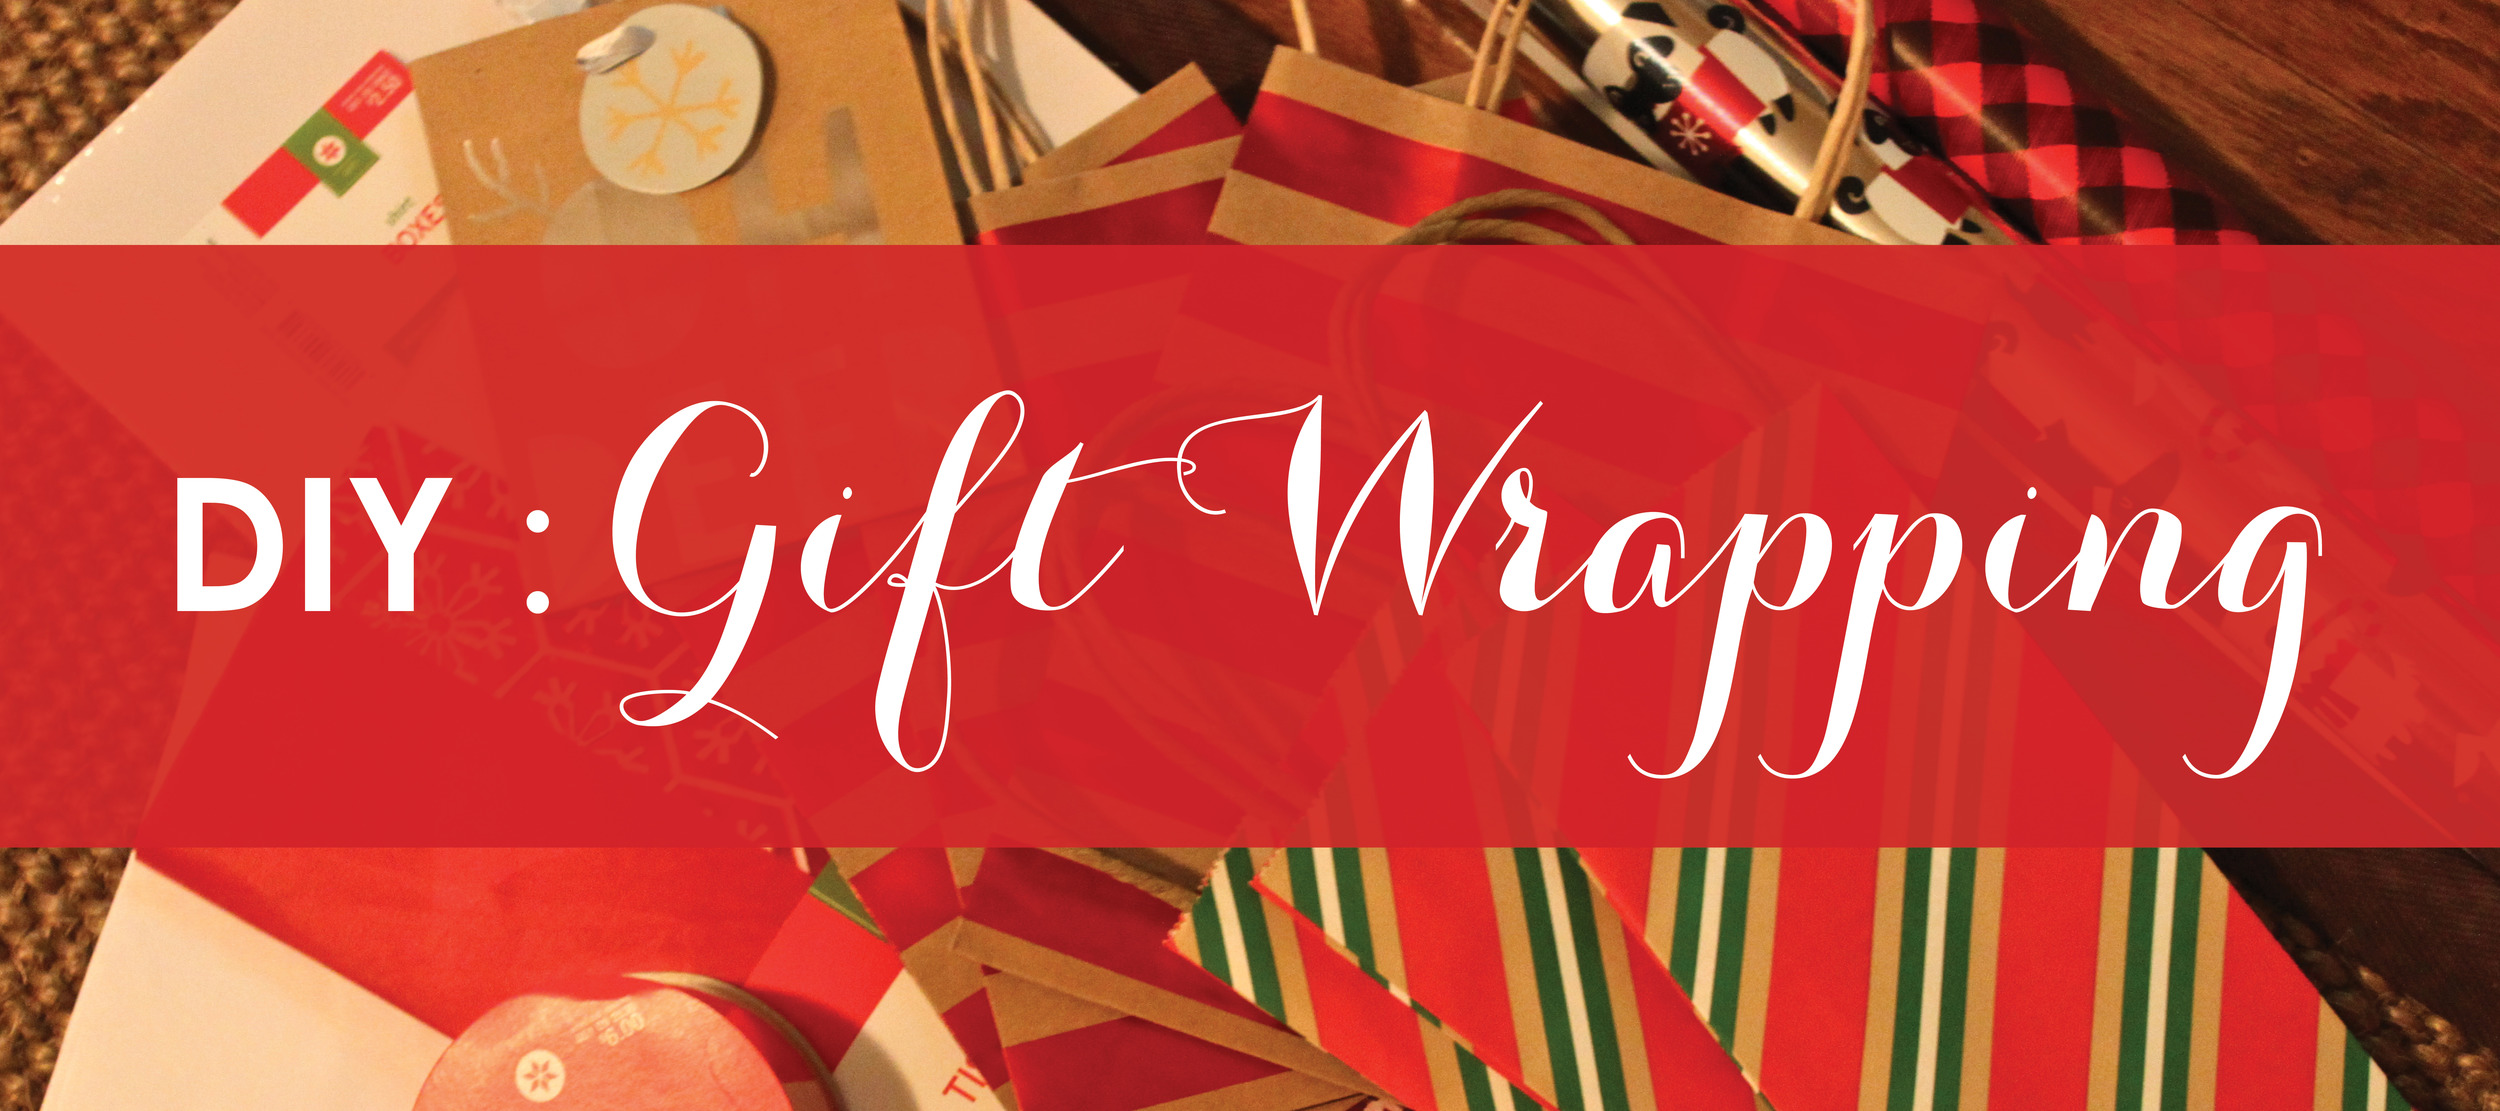 DIY_GiftWrapping.jpg